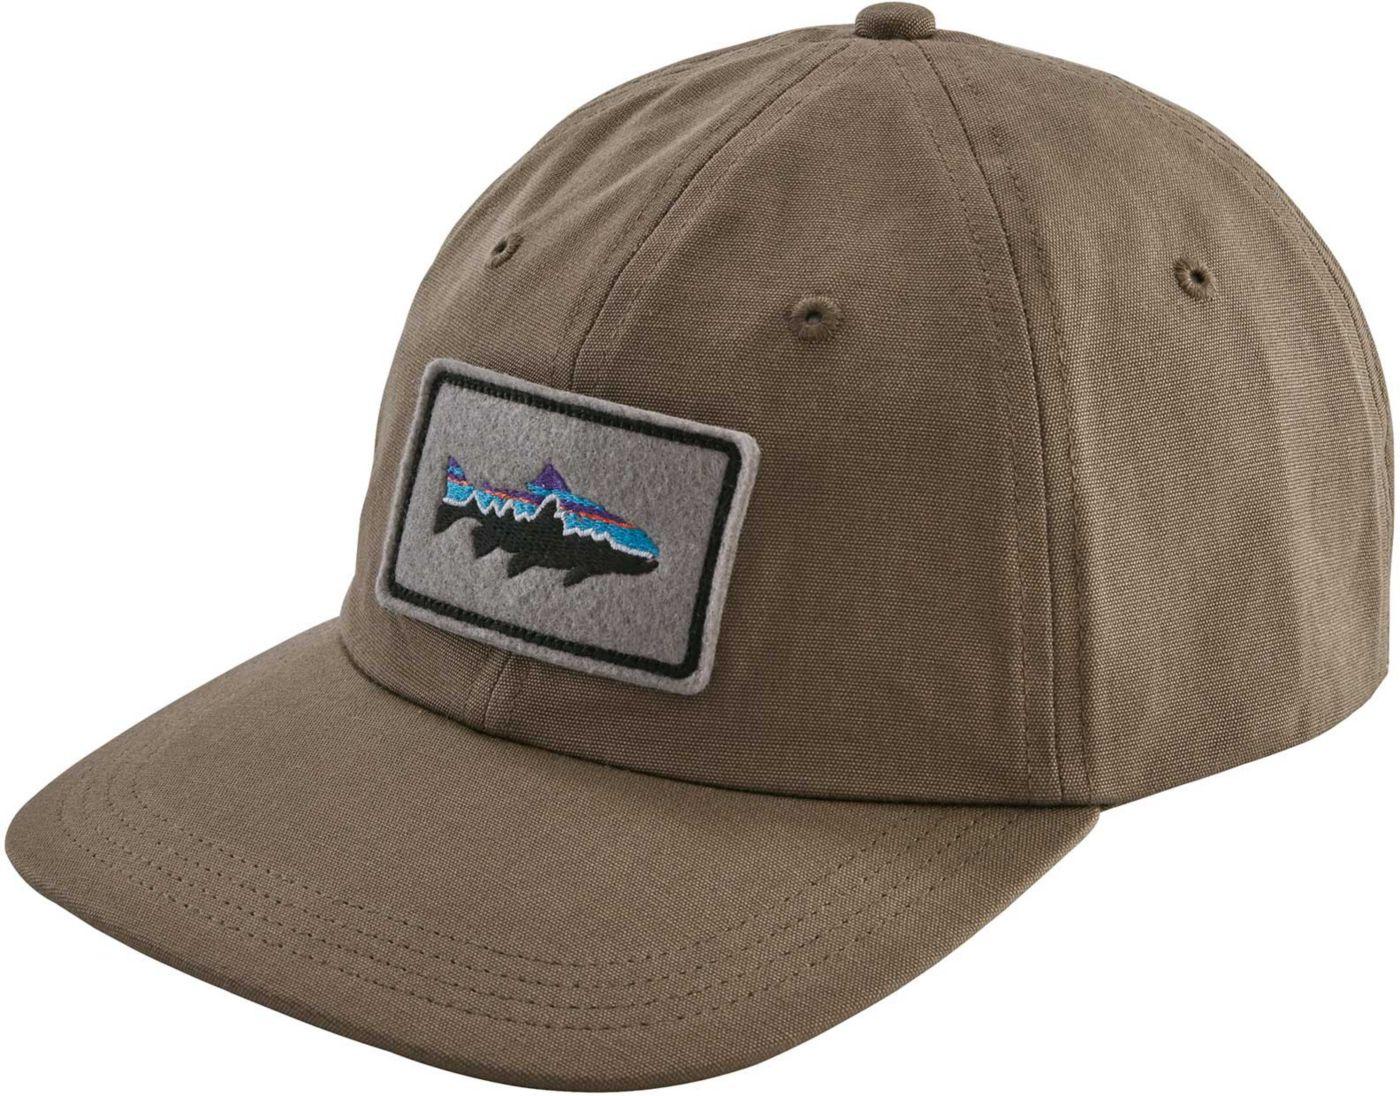 Patagonia Men's Fitz Roy Trout Patch Trad Cap